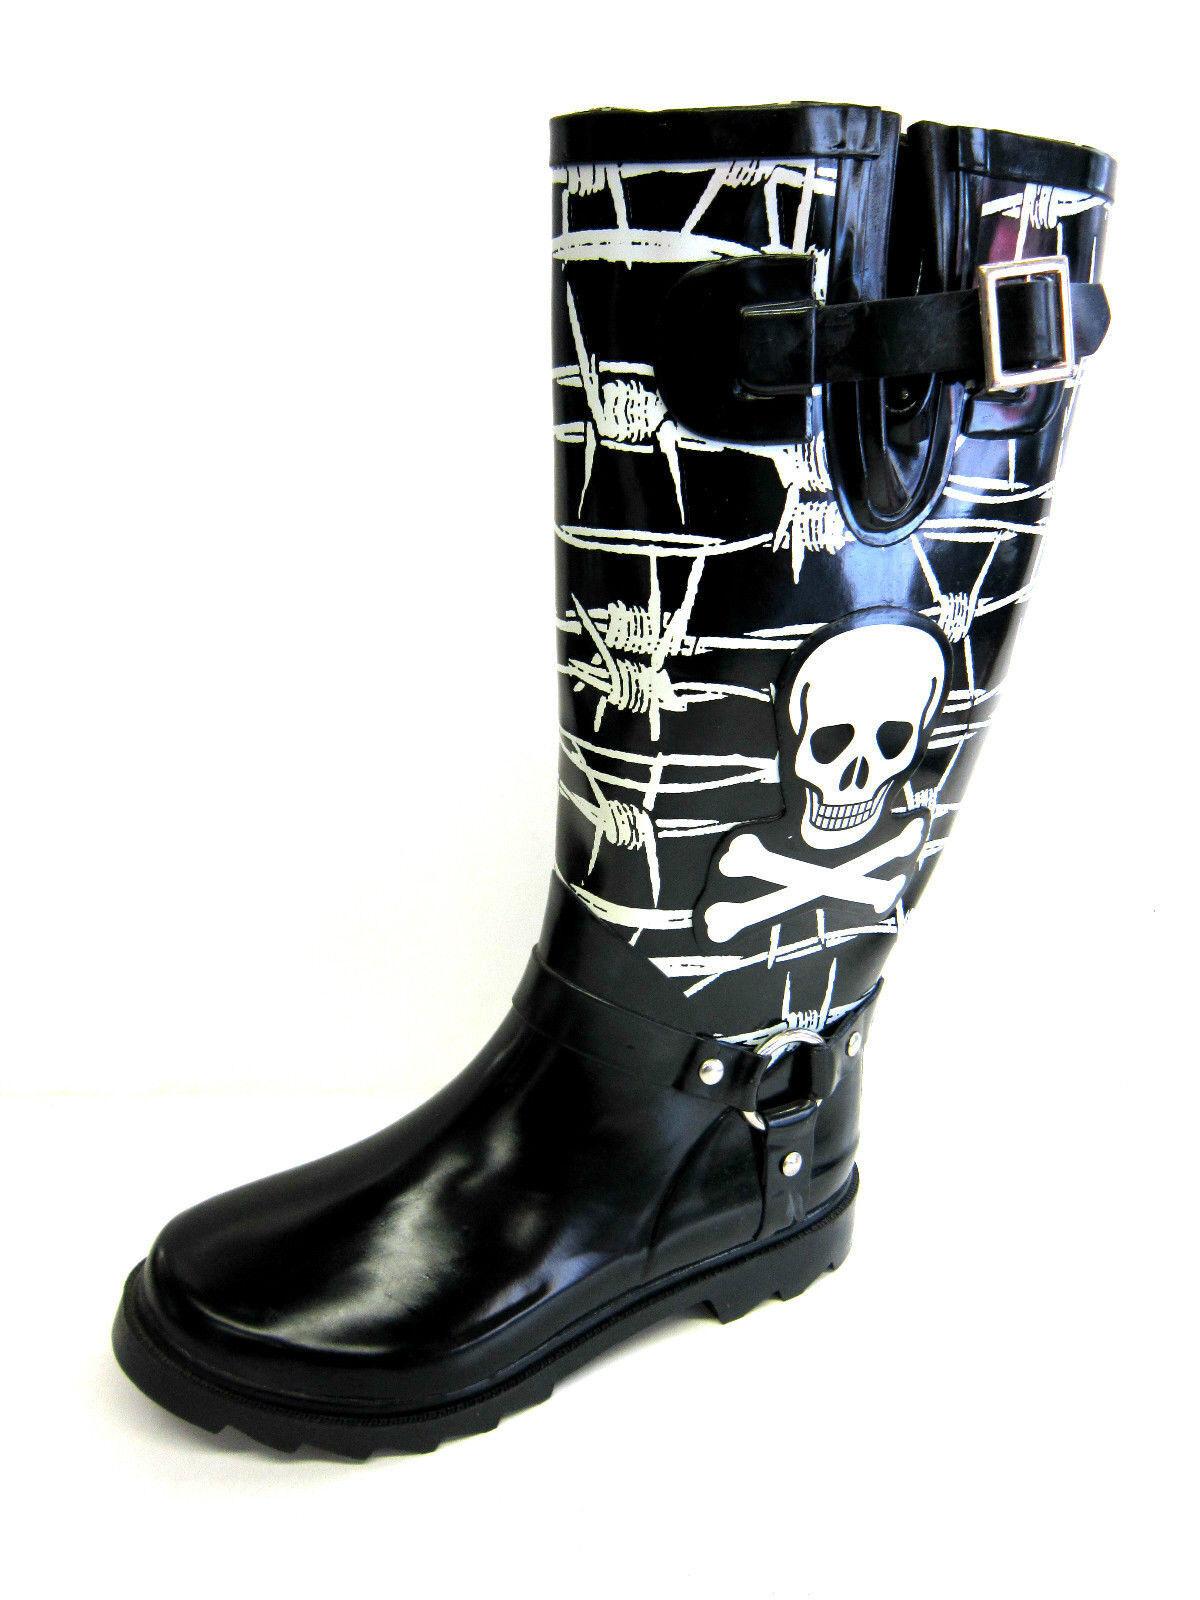 X1107- Ladies Black & White Rubber Wellingtons- Skull Design- Great Price!